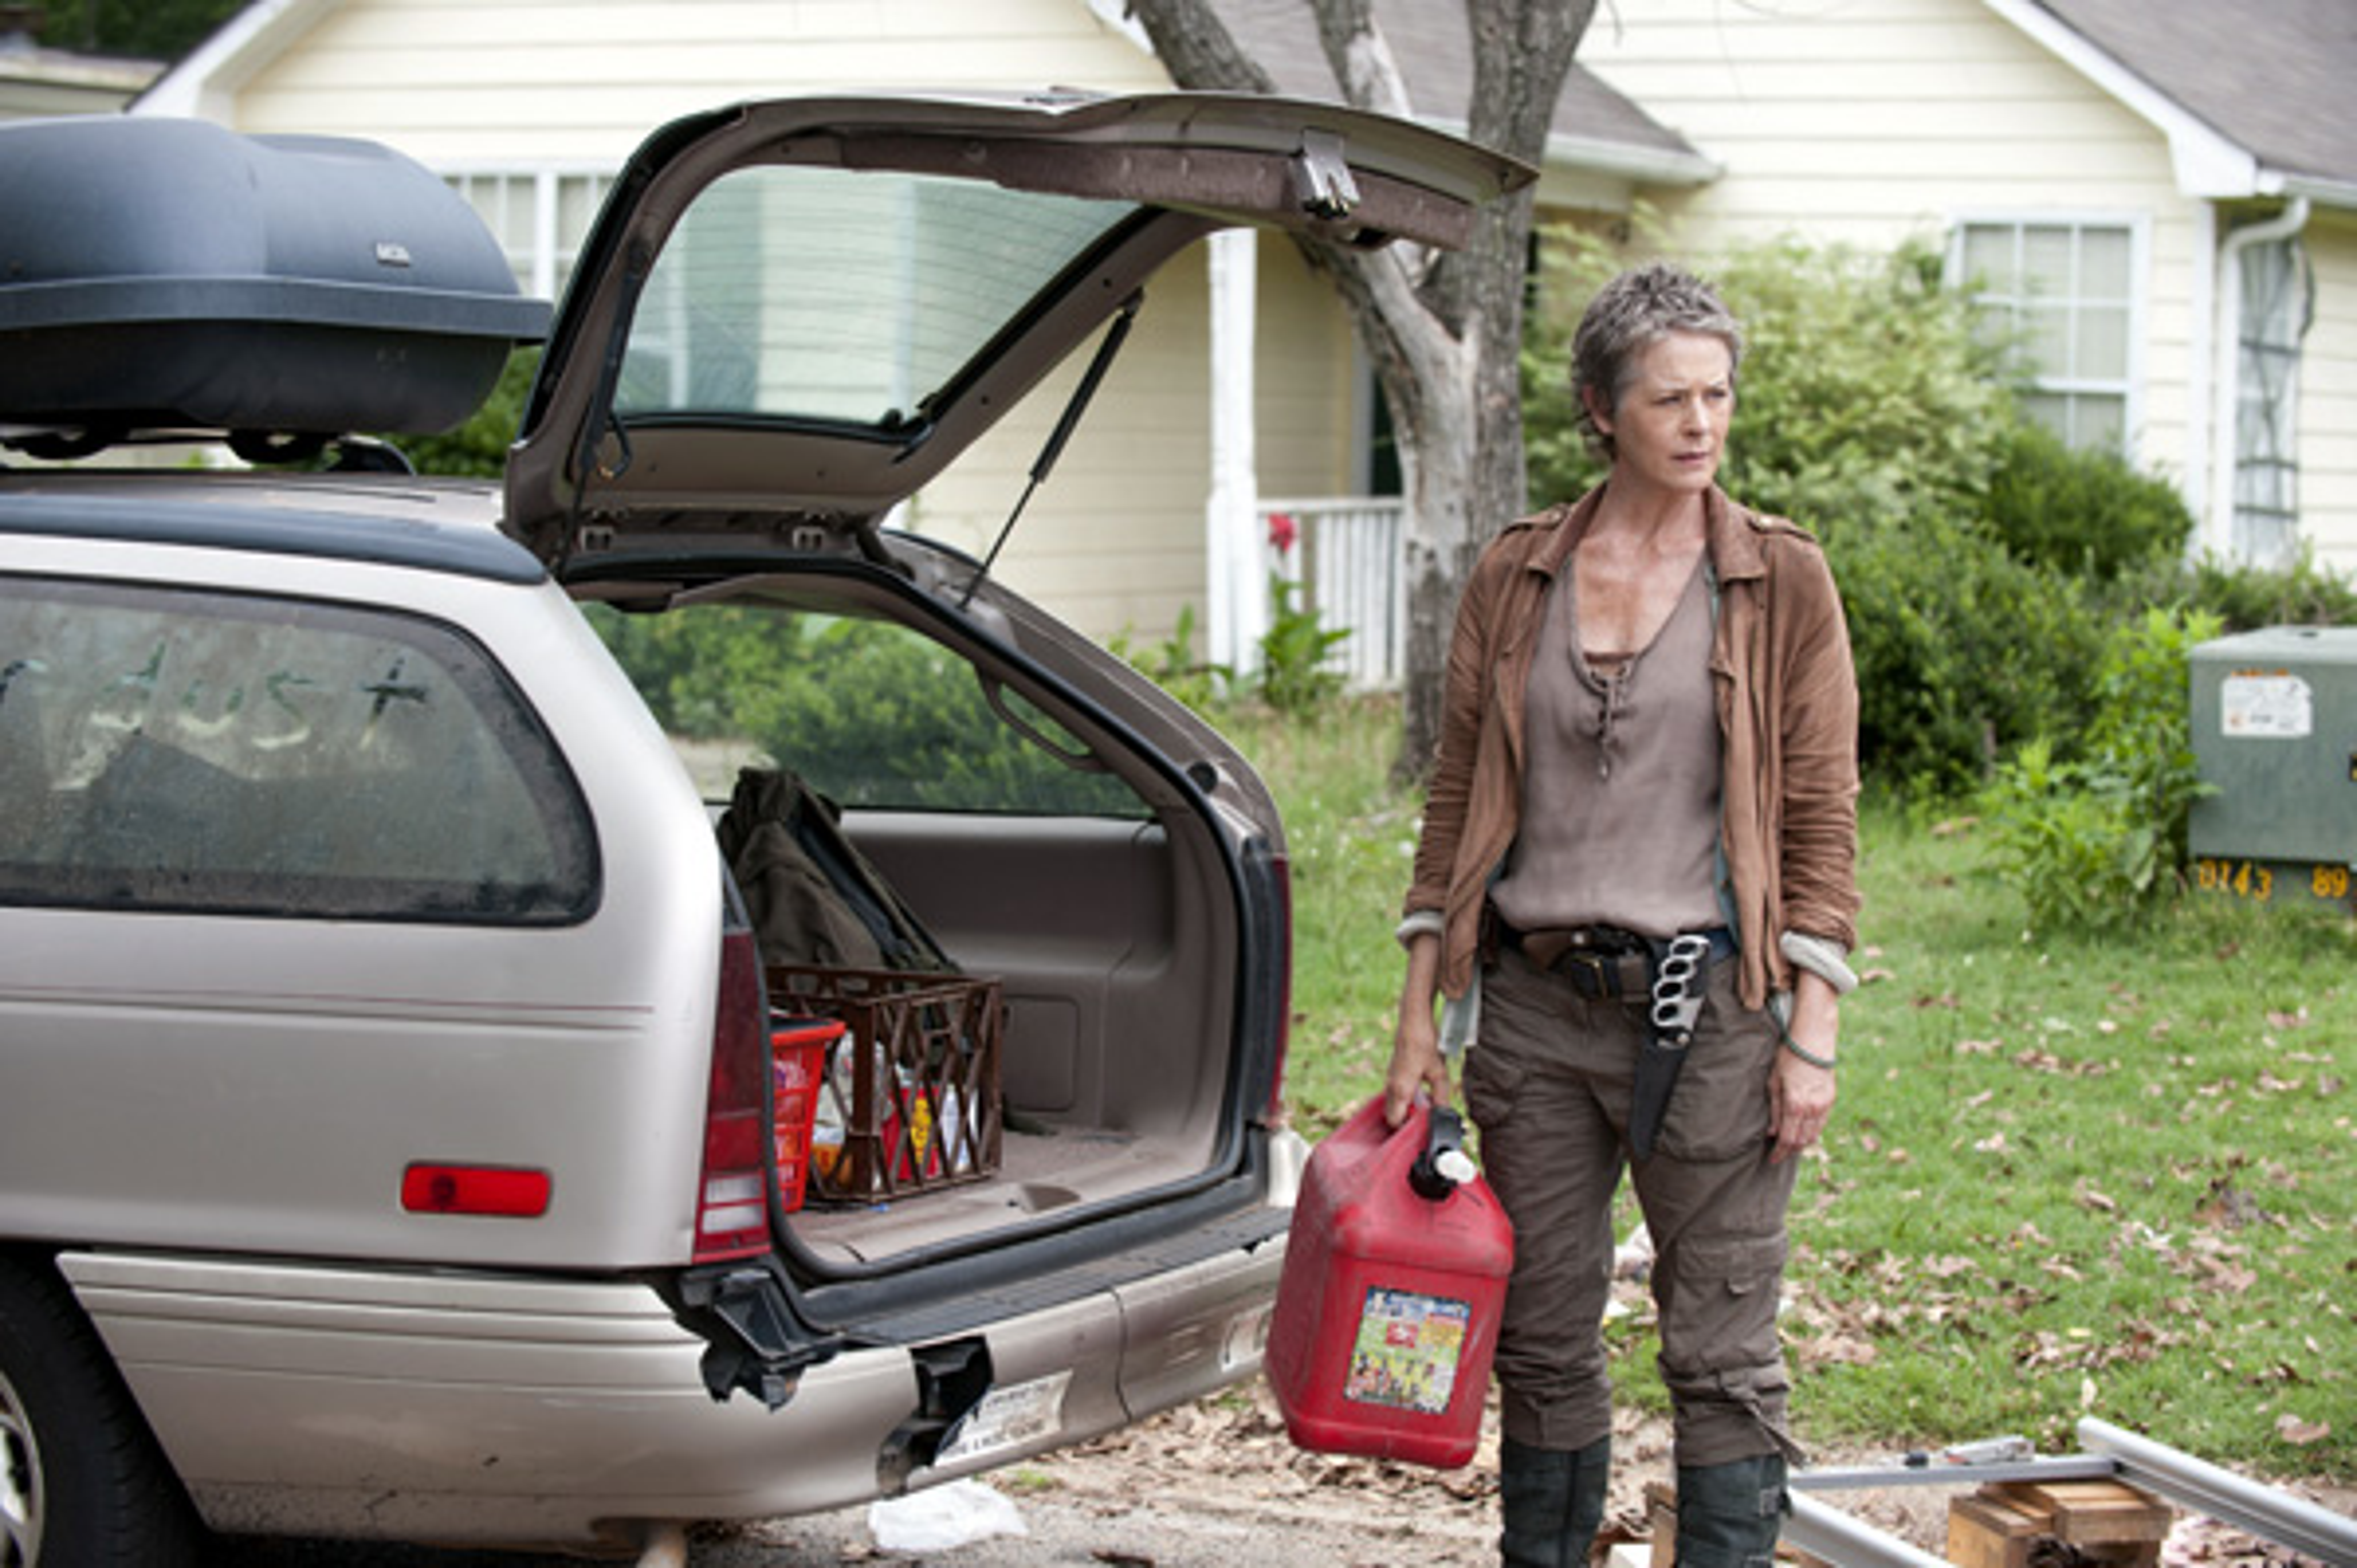 File:The-walking-dead-season4-episode4-indifference-carol-car.jpg